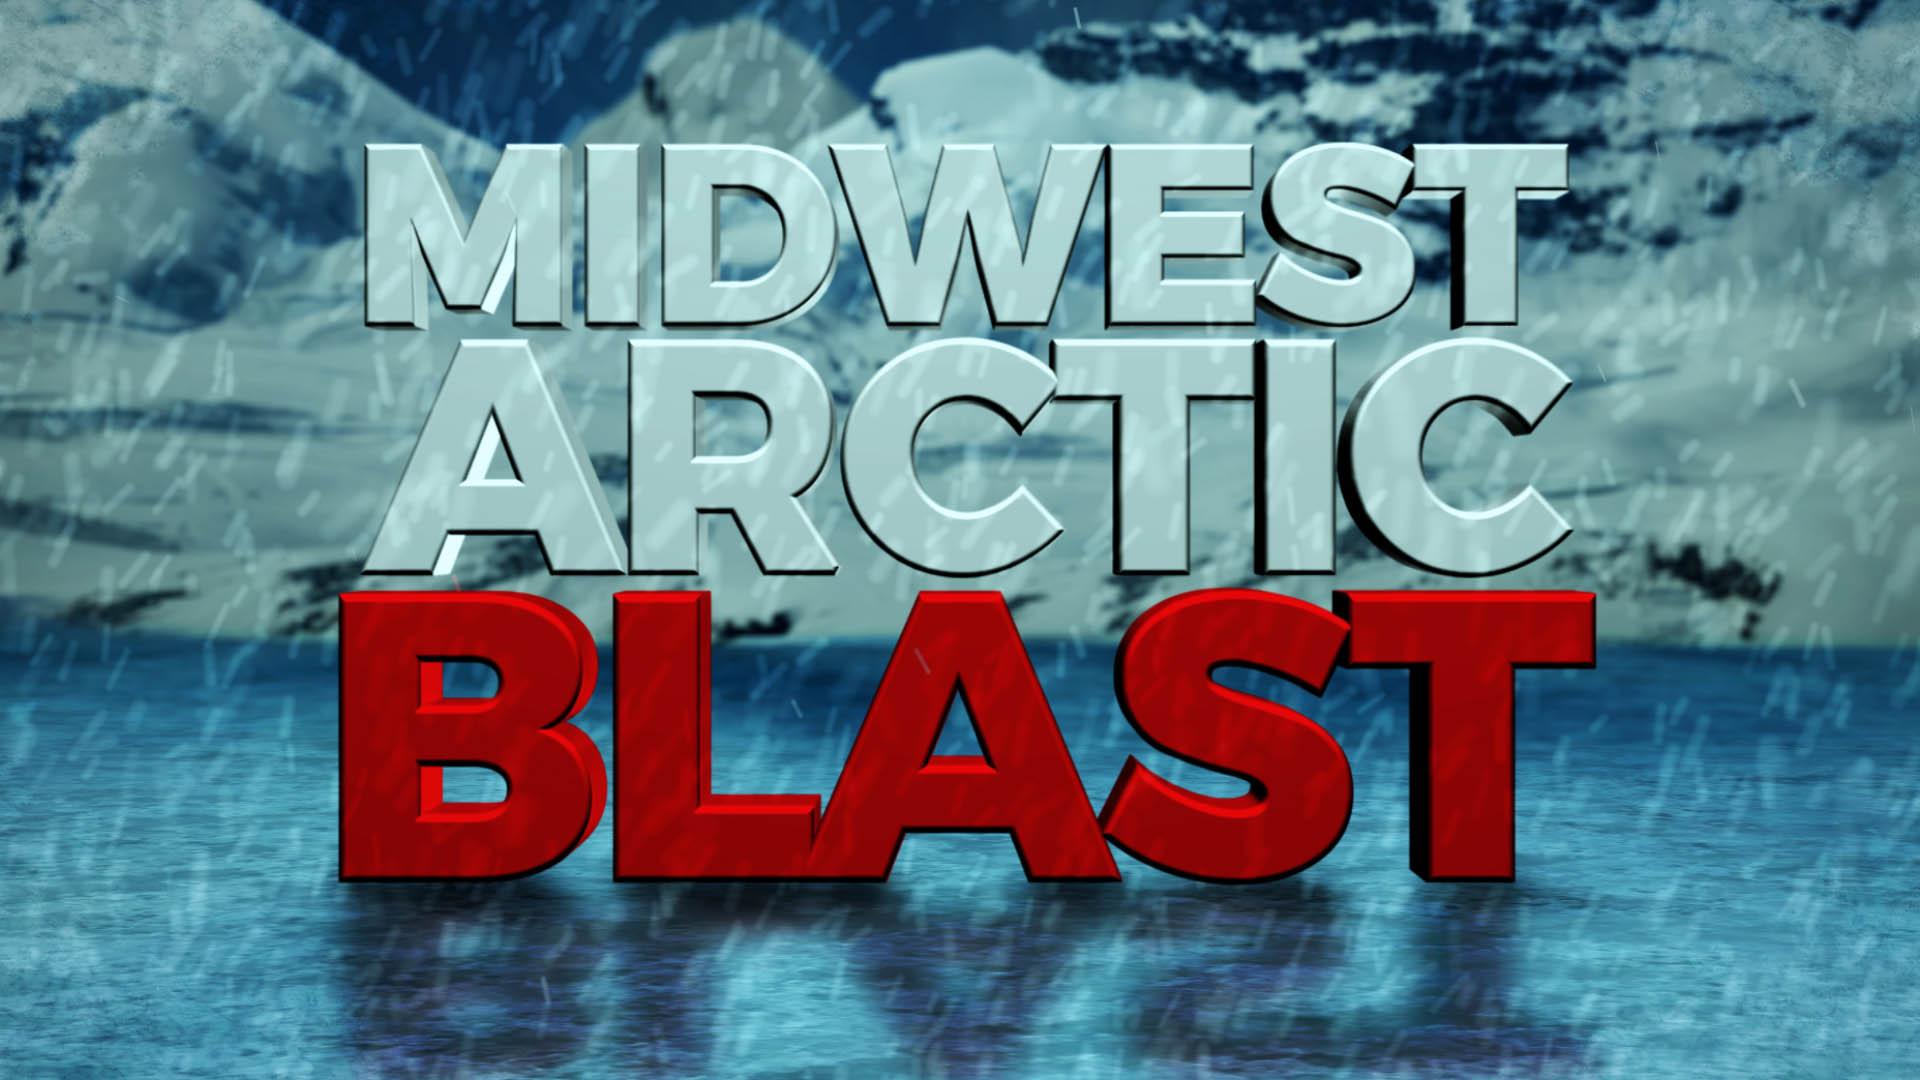 KELO Midwest Arctic Blast-1188034456